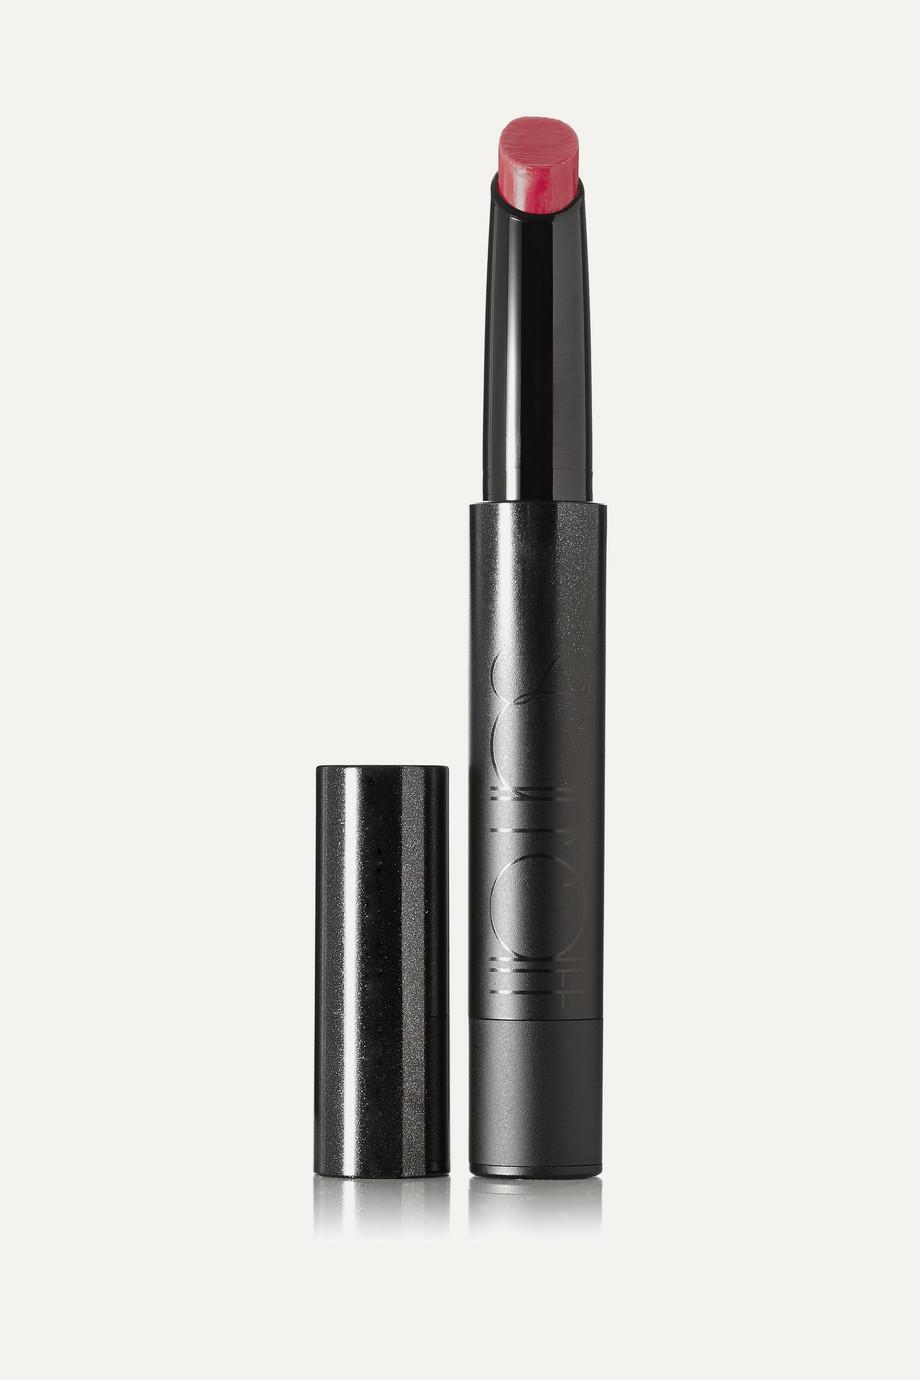 Surratt Beauty Lipslique – Perfectionniste 12 – Lippenstift